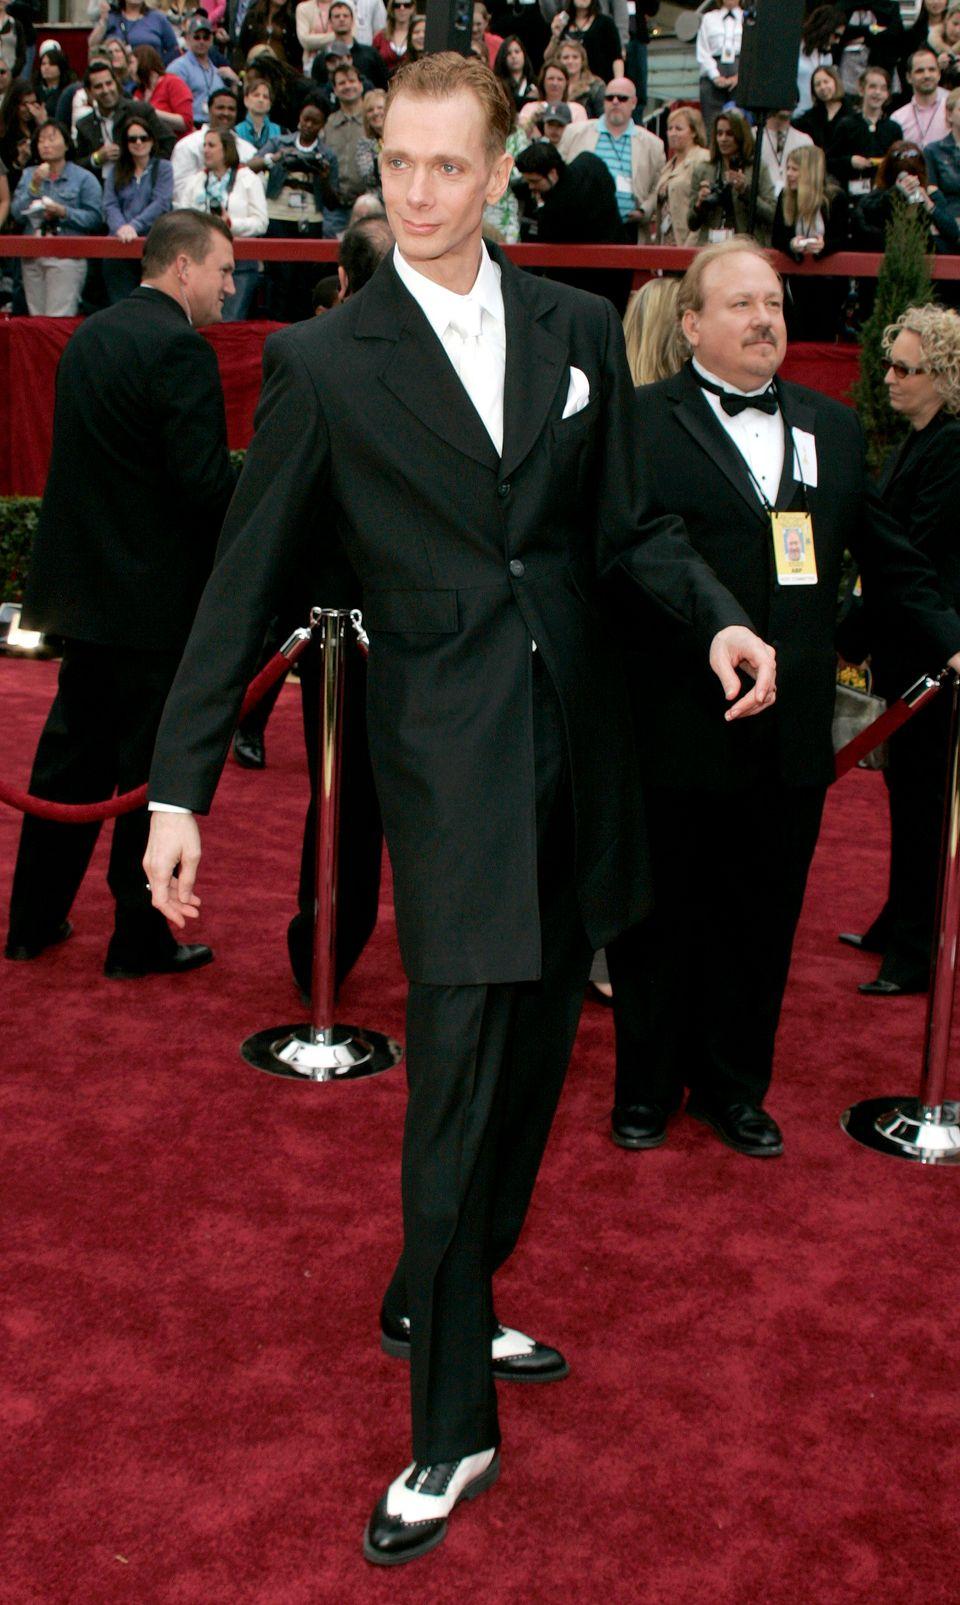 Doug Jones attends the Oscars on Feb. 25,